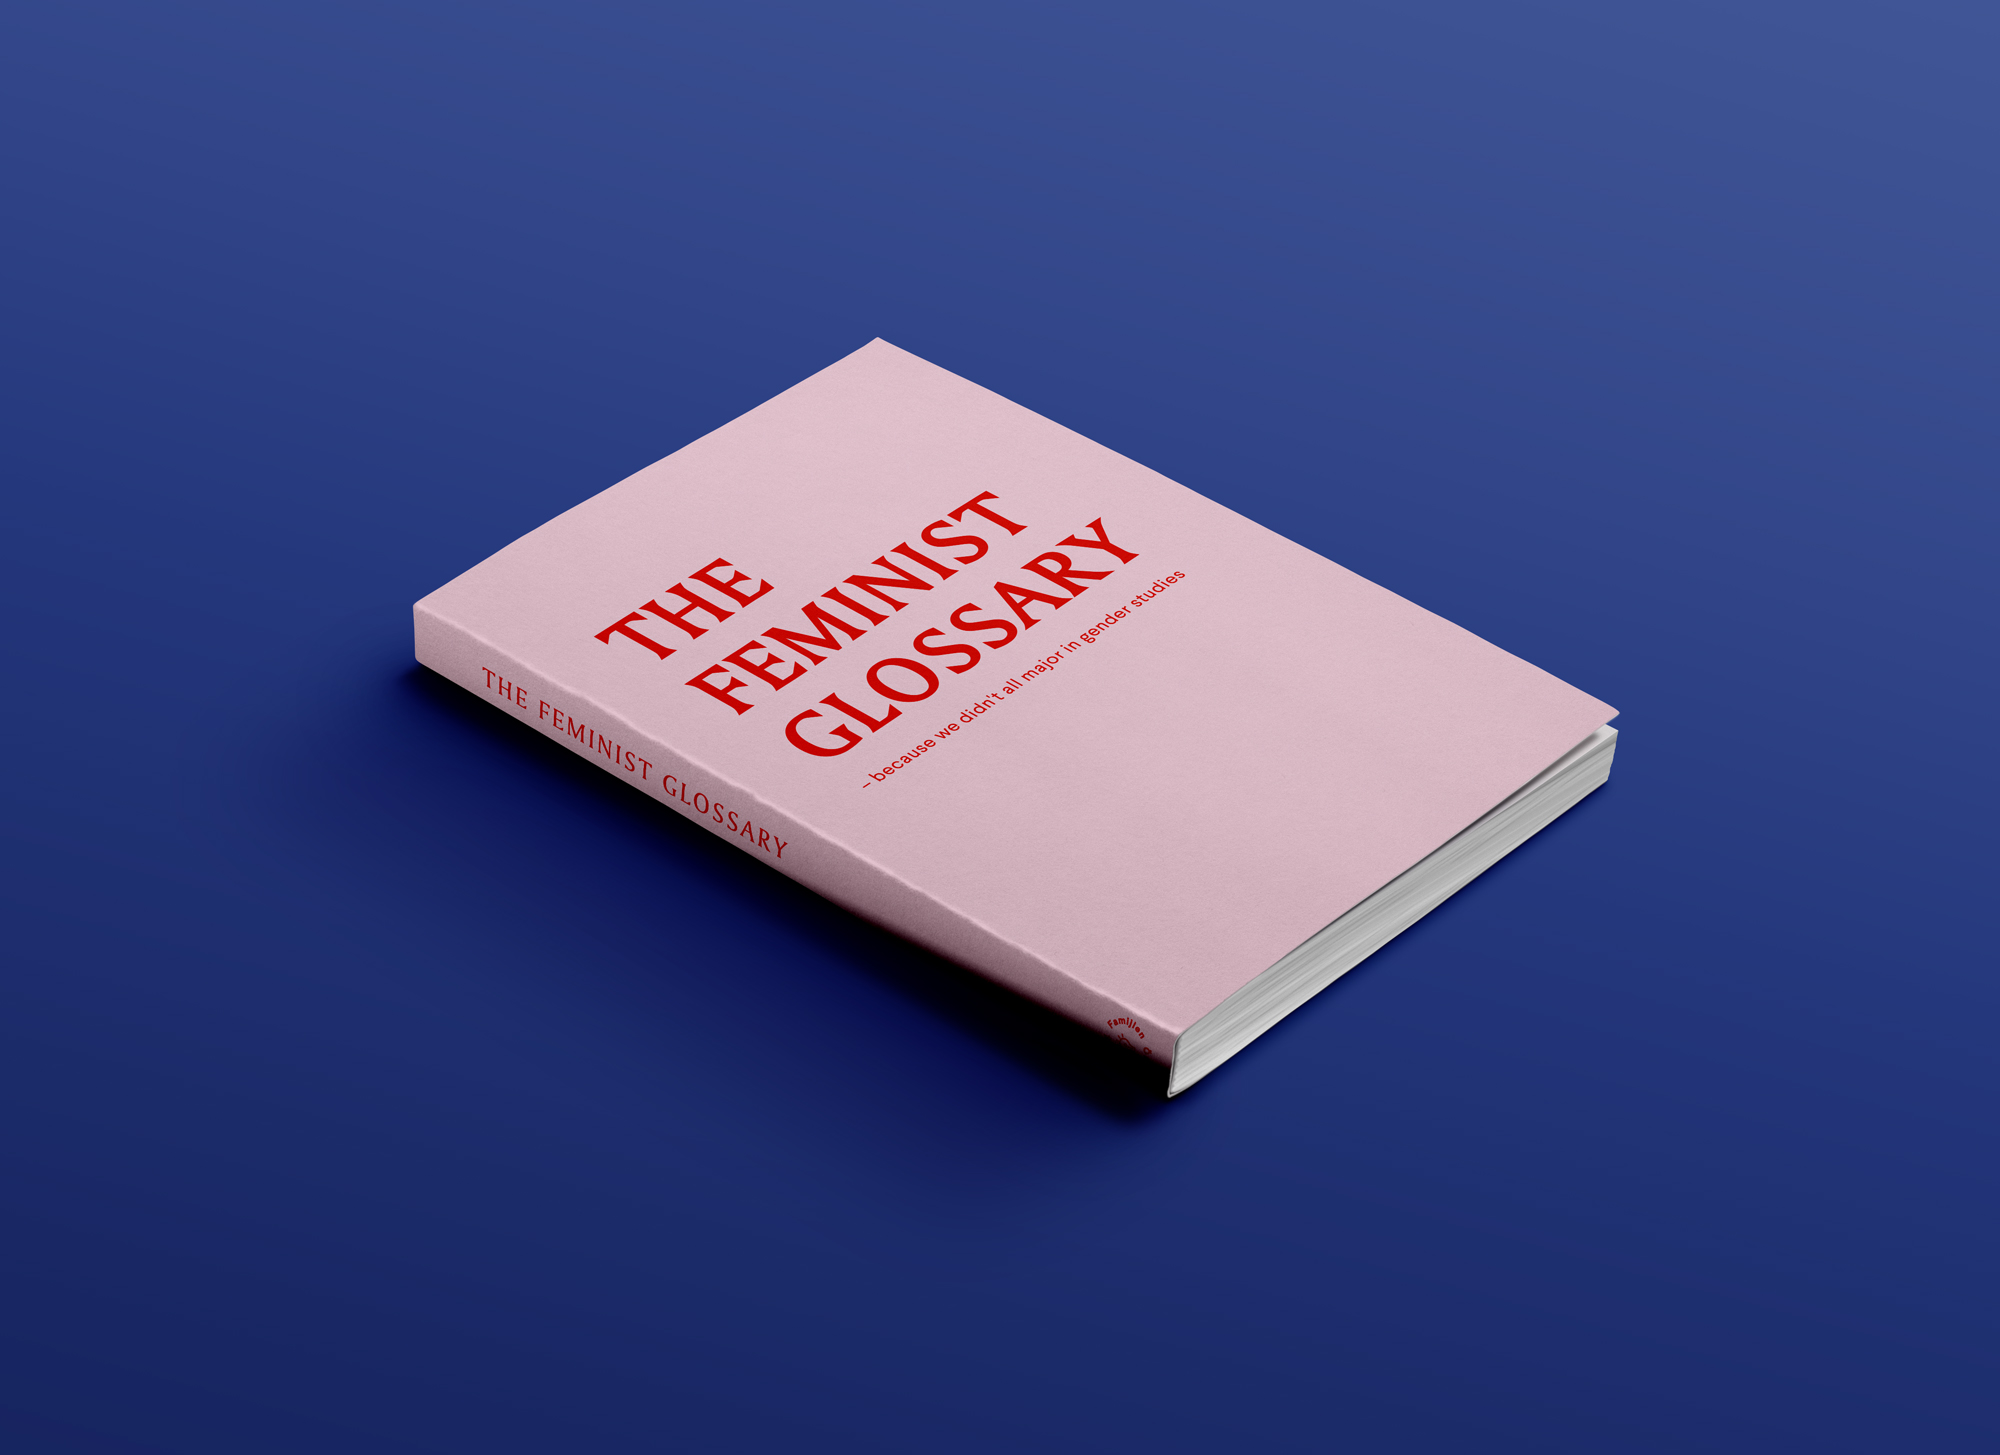 Cover-book-isometric-view-presentation-mockup.jpg